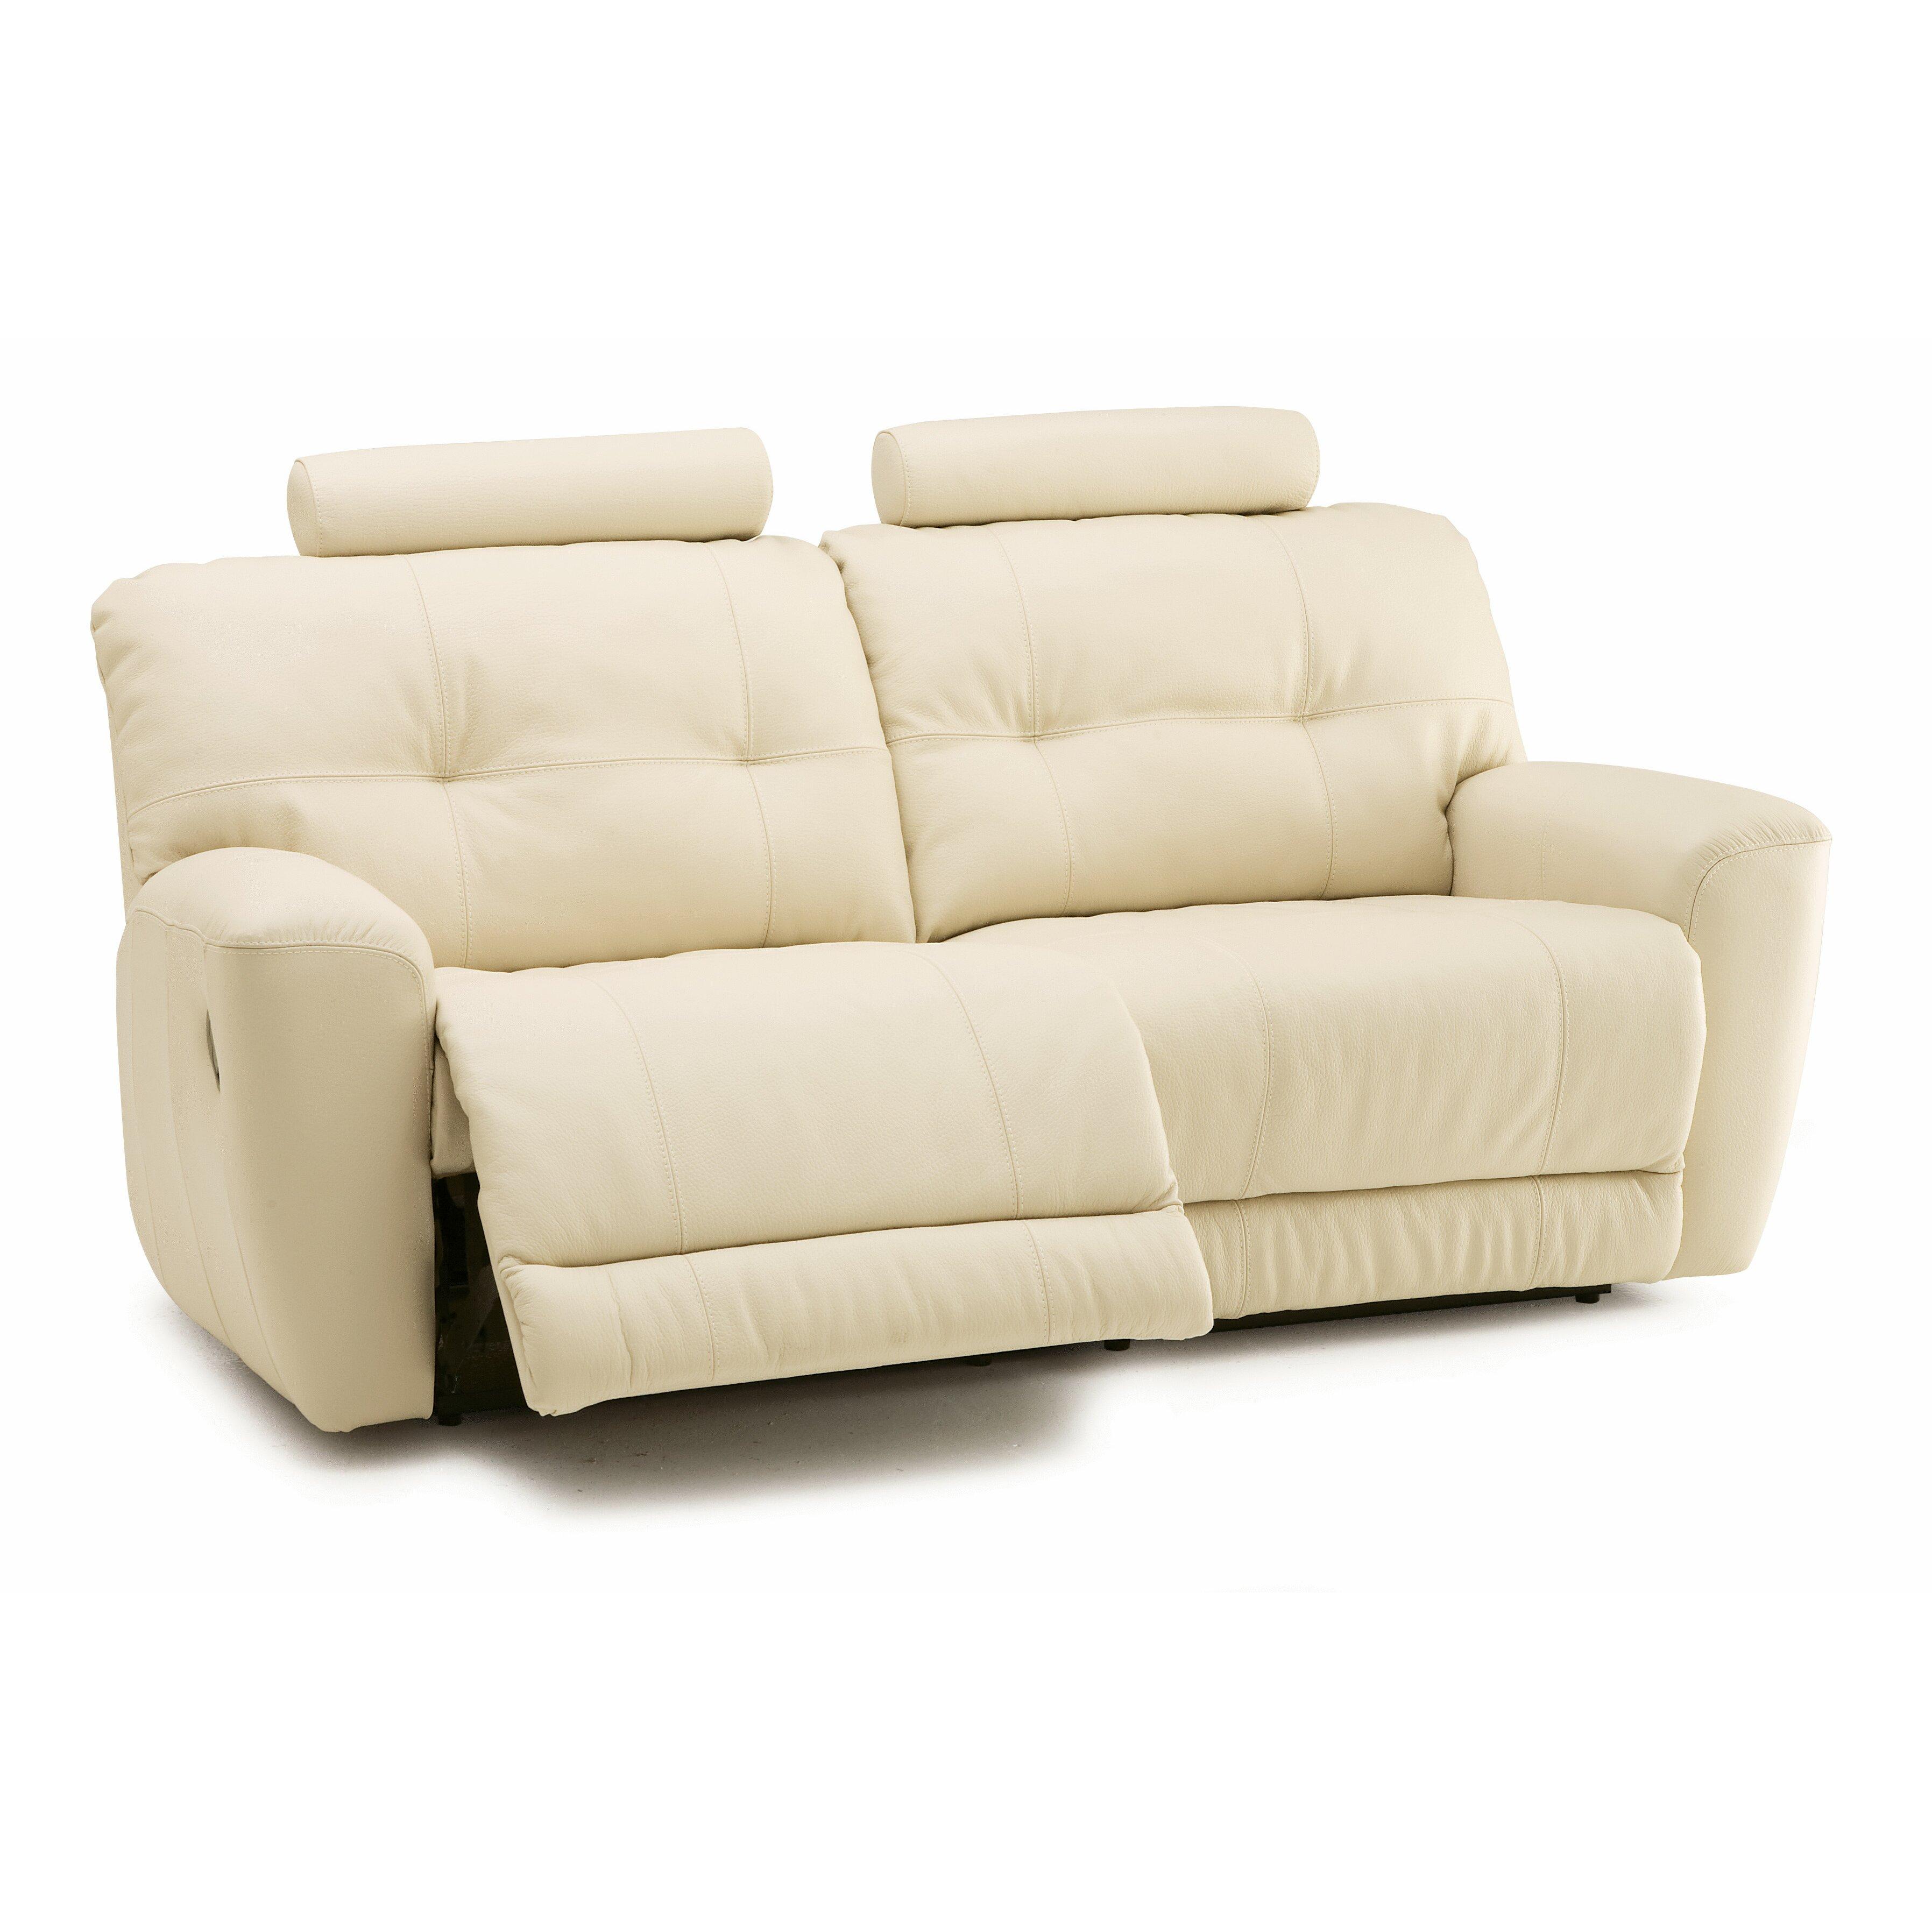 Palliser Leather Reclining Sofa Reviews: Galore Reclining Sofa